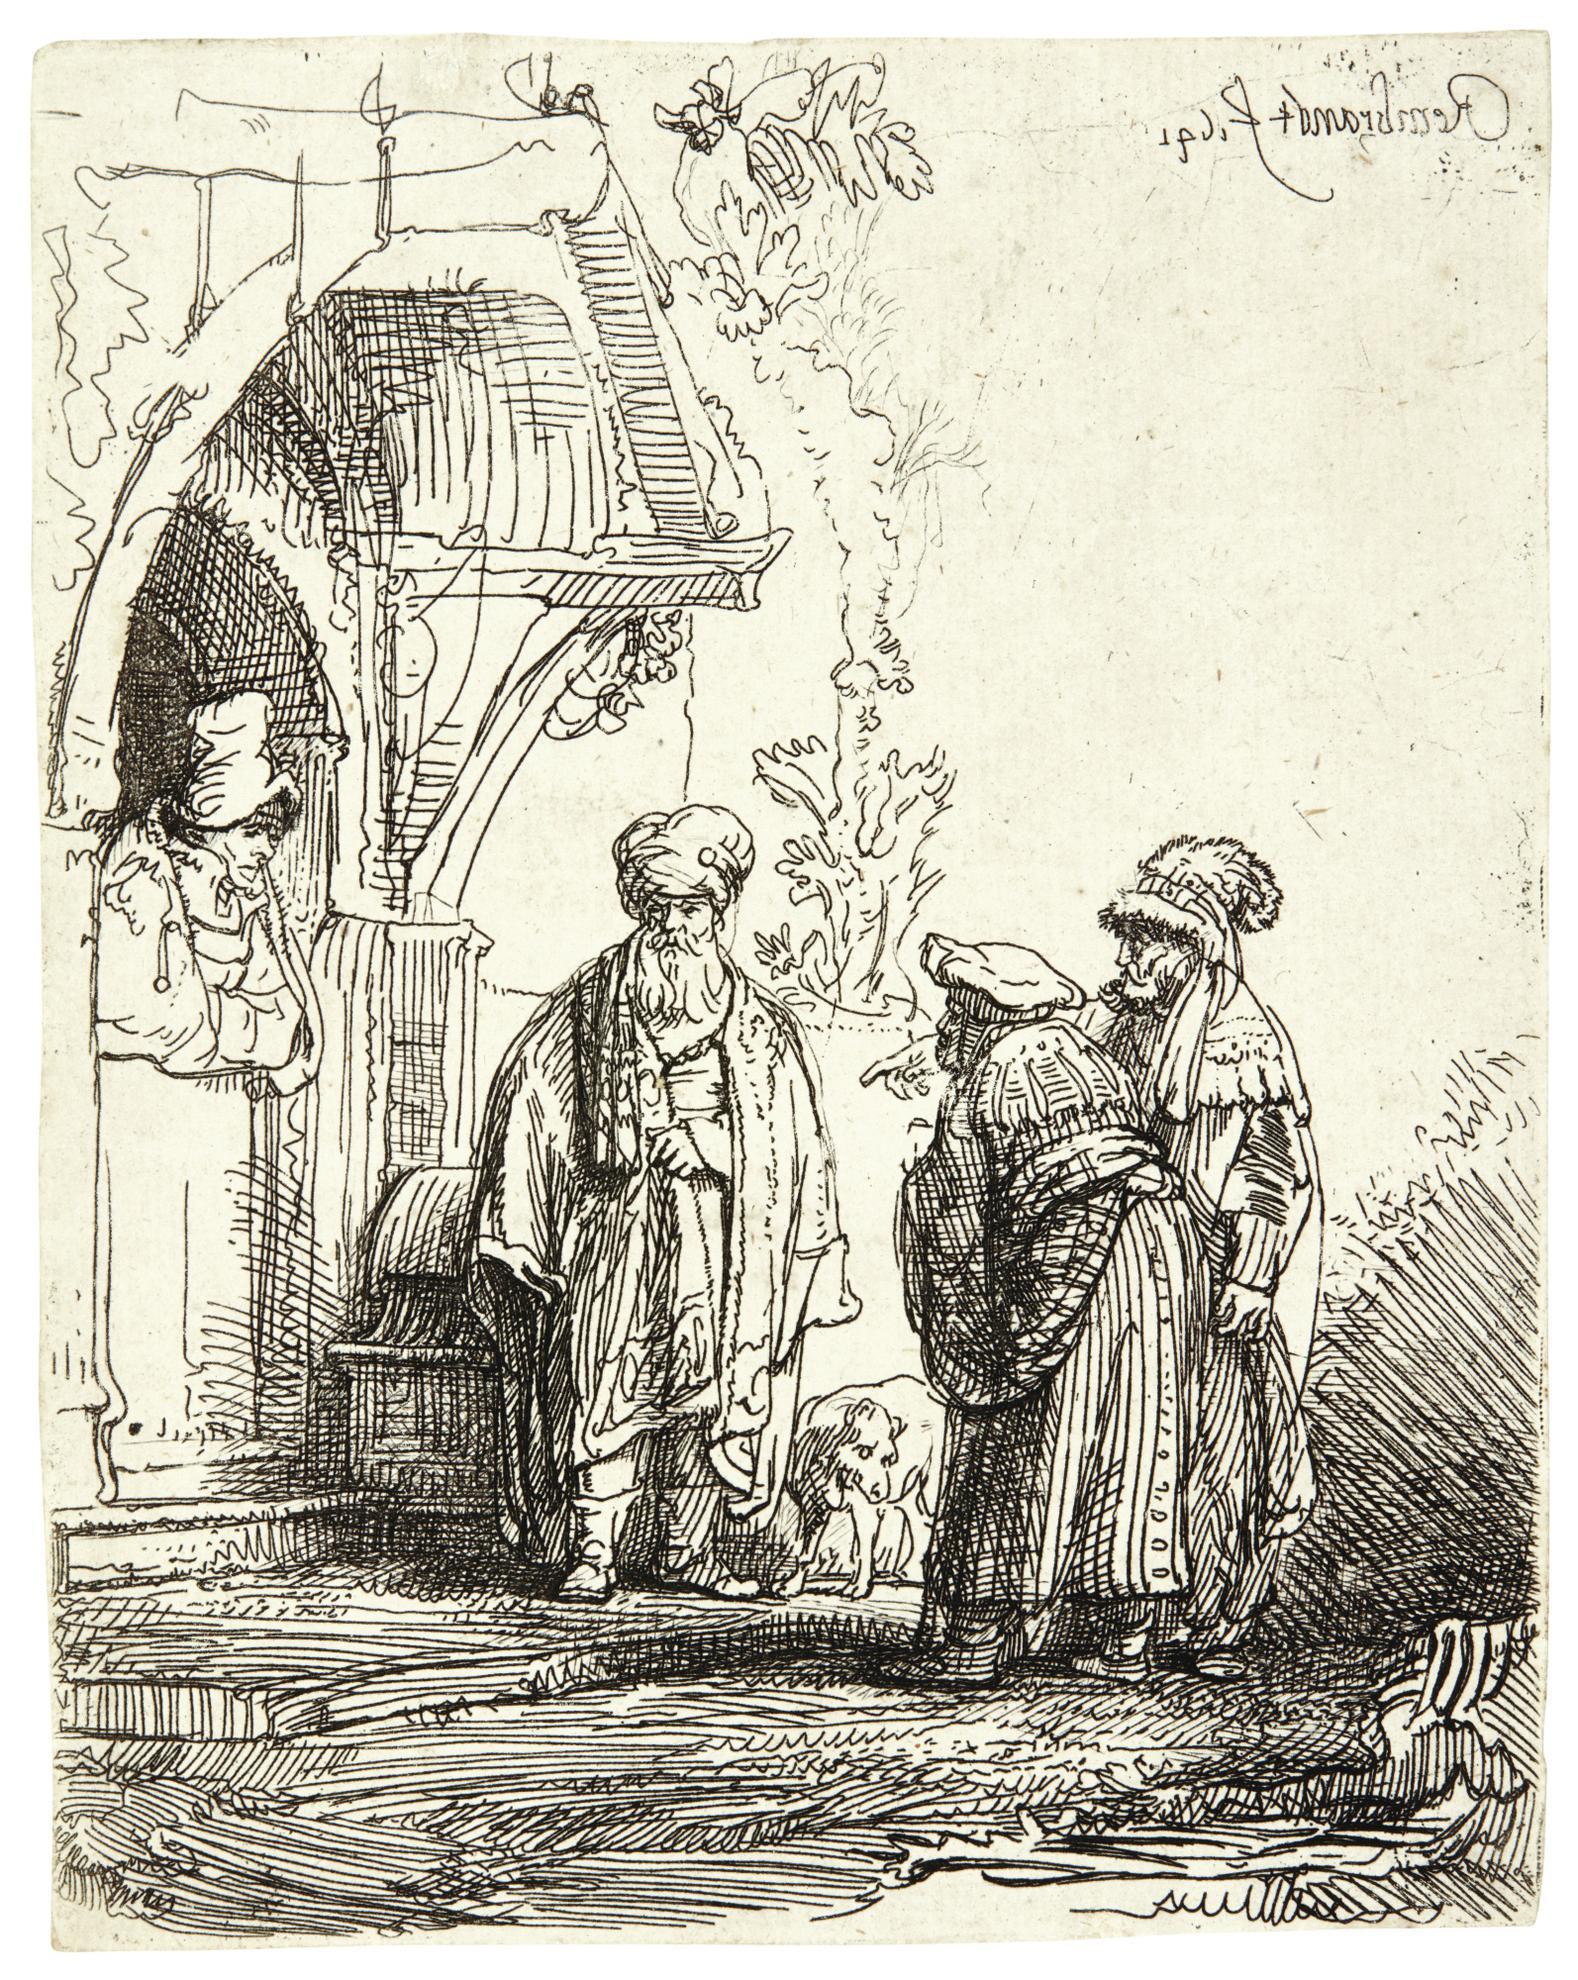 Rembrandt van Rijn-Three Oriental Figures (Jacob And Laban?) (B., Holl. 118; New Holl. 190; H. 183)-1641